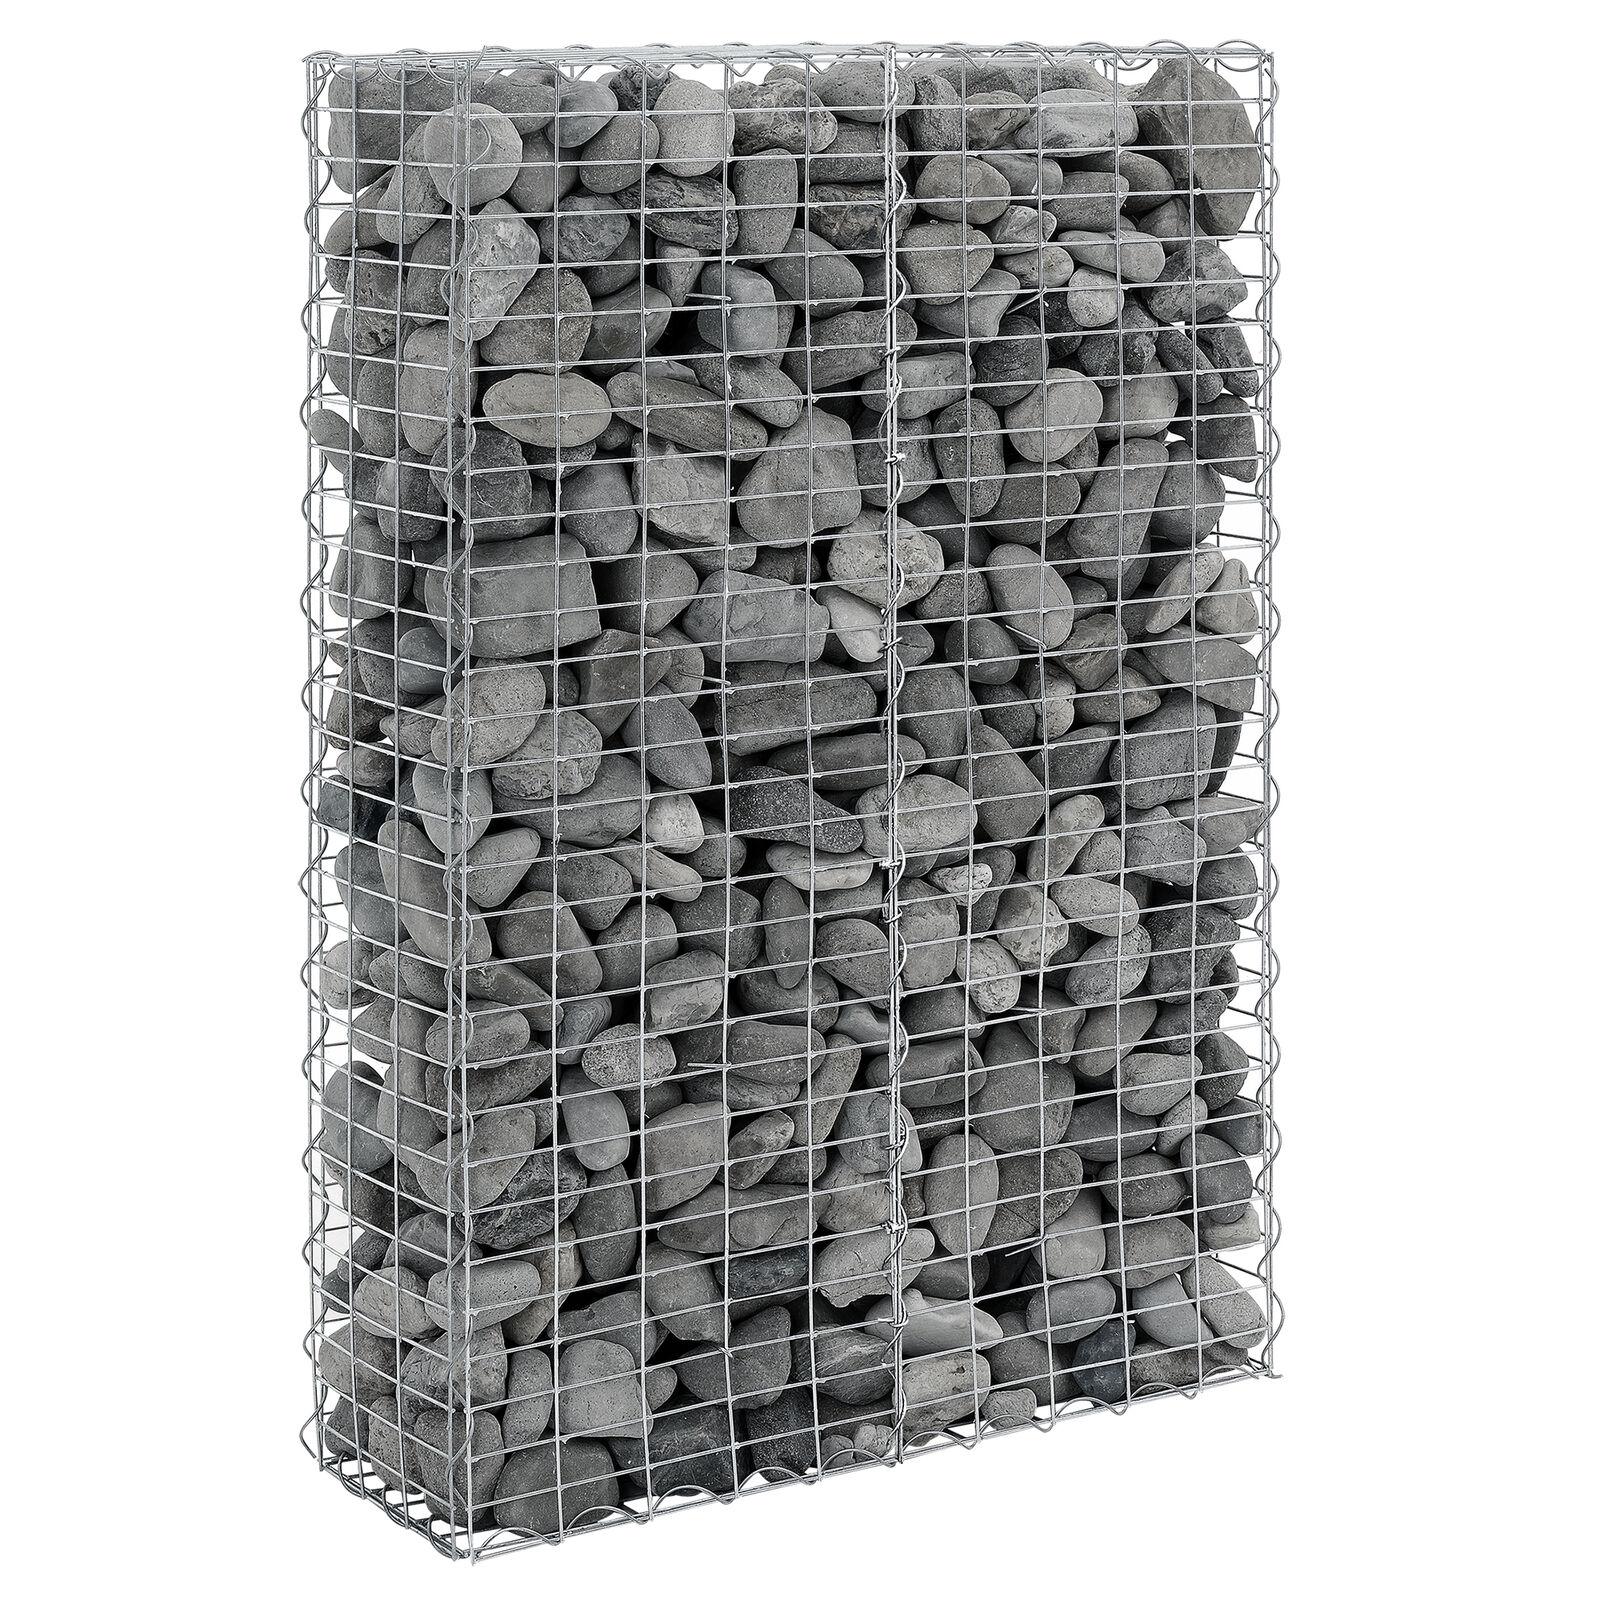 Gabione 100x30x150cm steingabione cesta de piedra del muro de muro de alambre cesta piedra-Gabionen